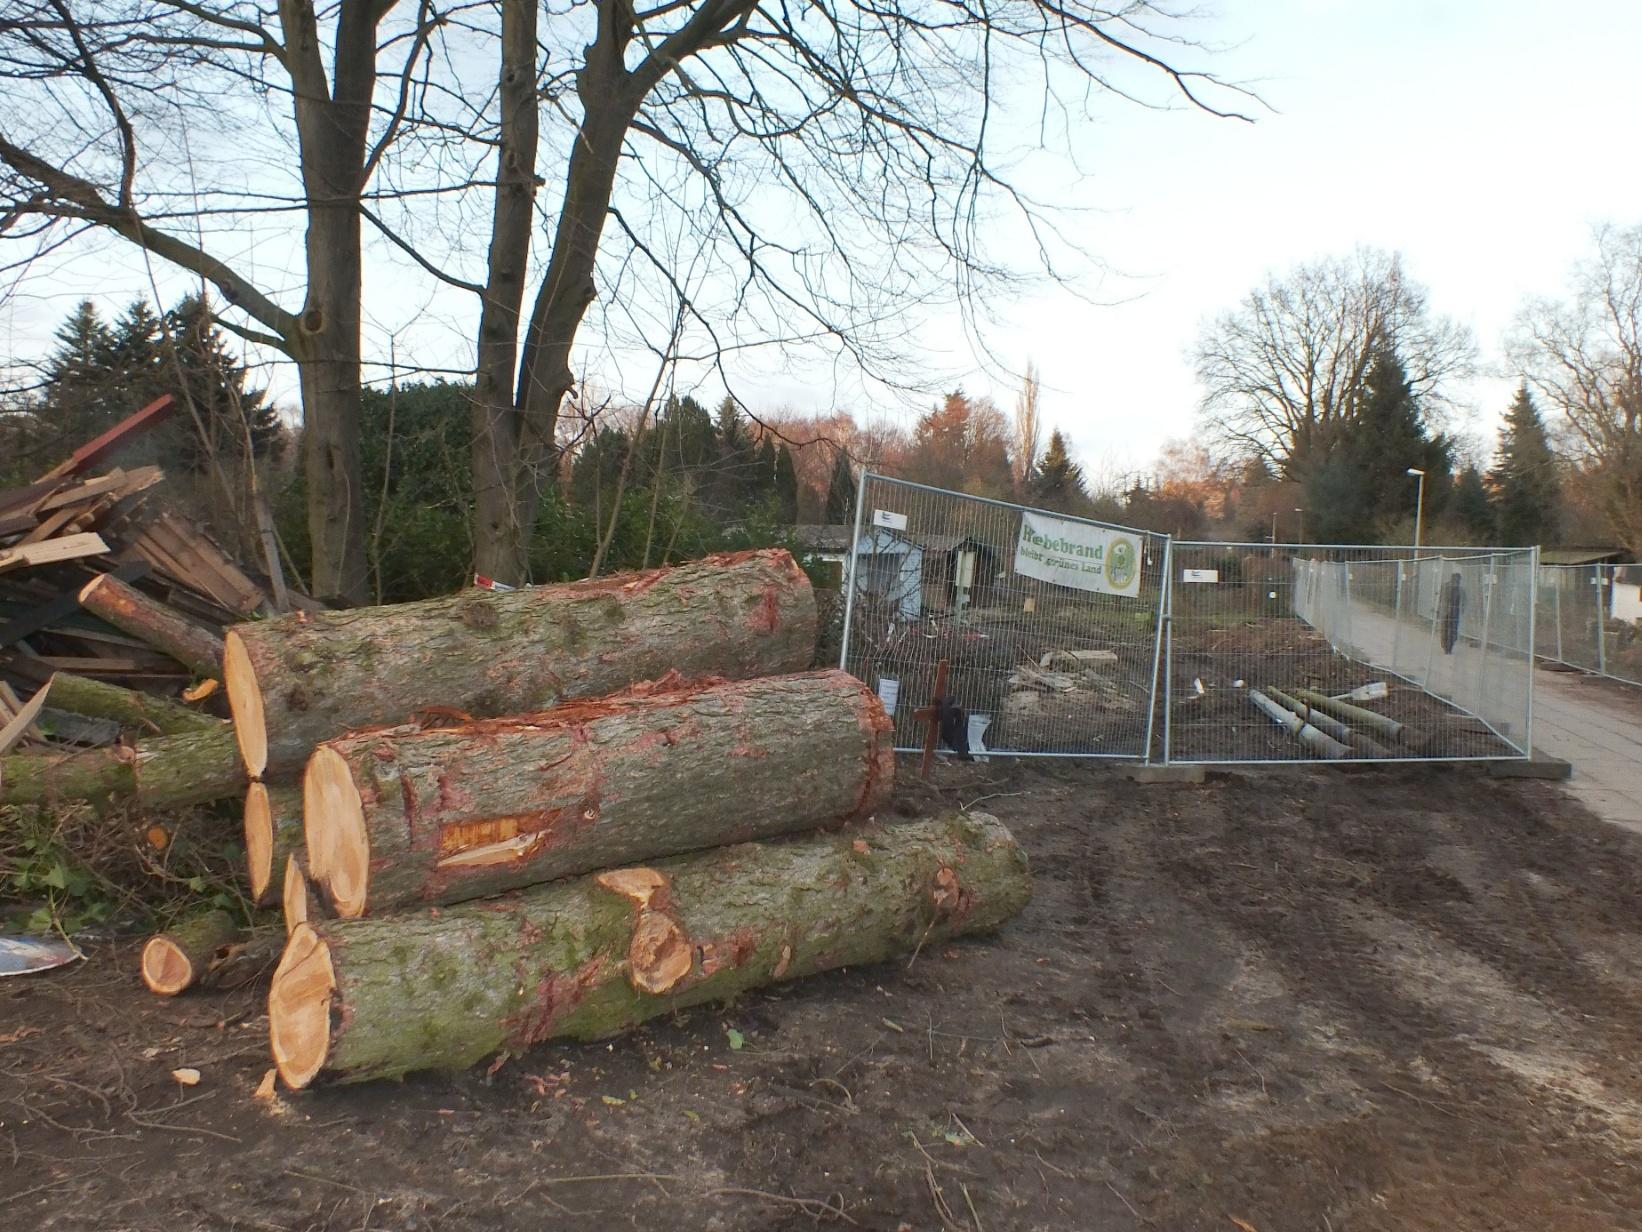 Februar 2016 Pergolenviertel gefällter Baum Laubenreste